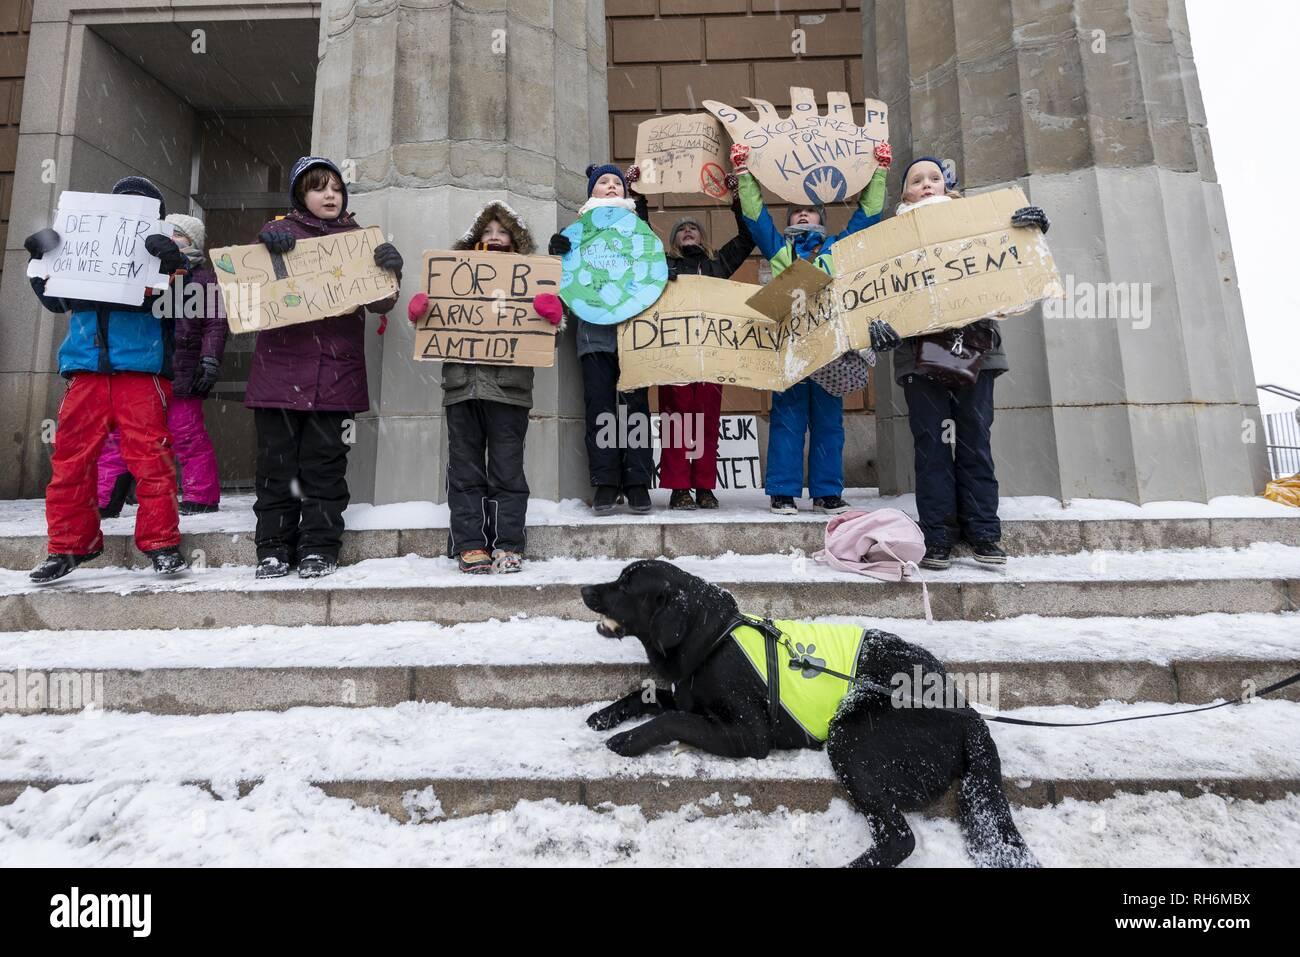 Stockholm, Sweden  1st Feb, 2019  Greta Thunberg, a Swedish